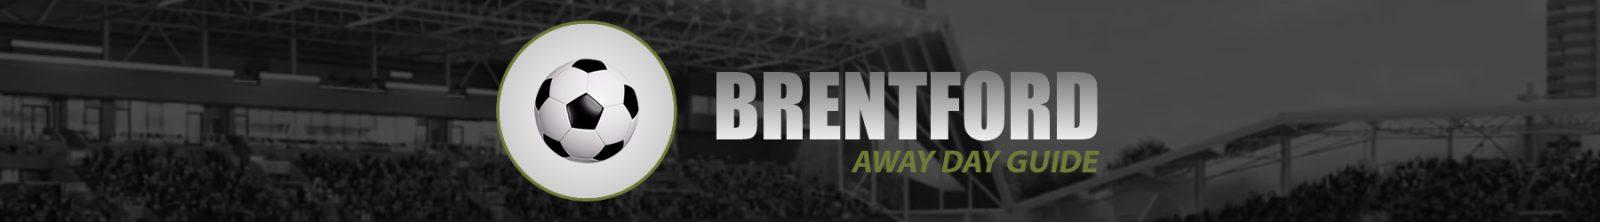 Brentford Away